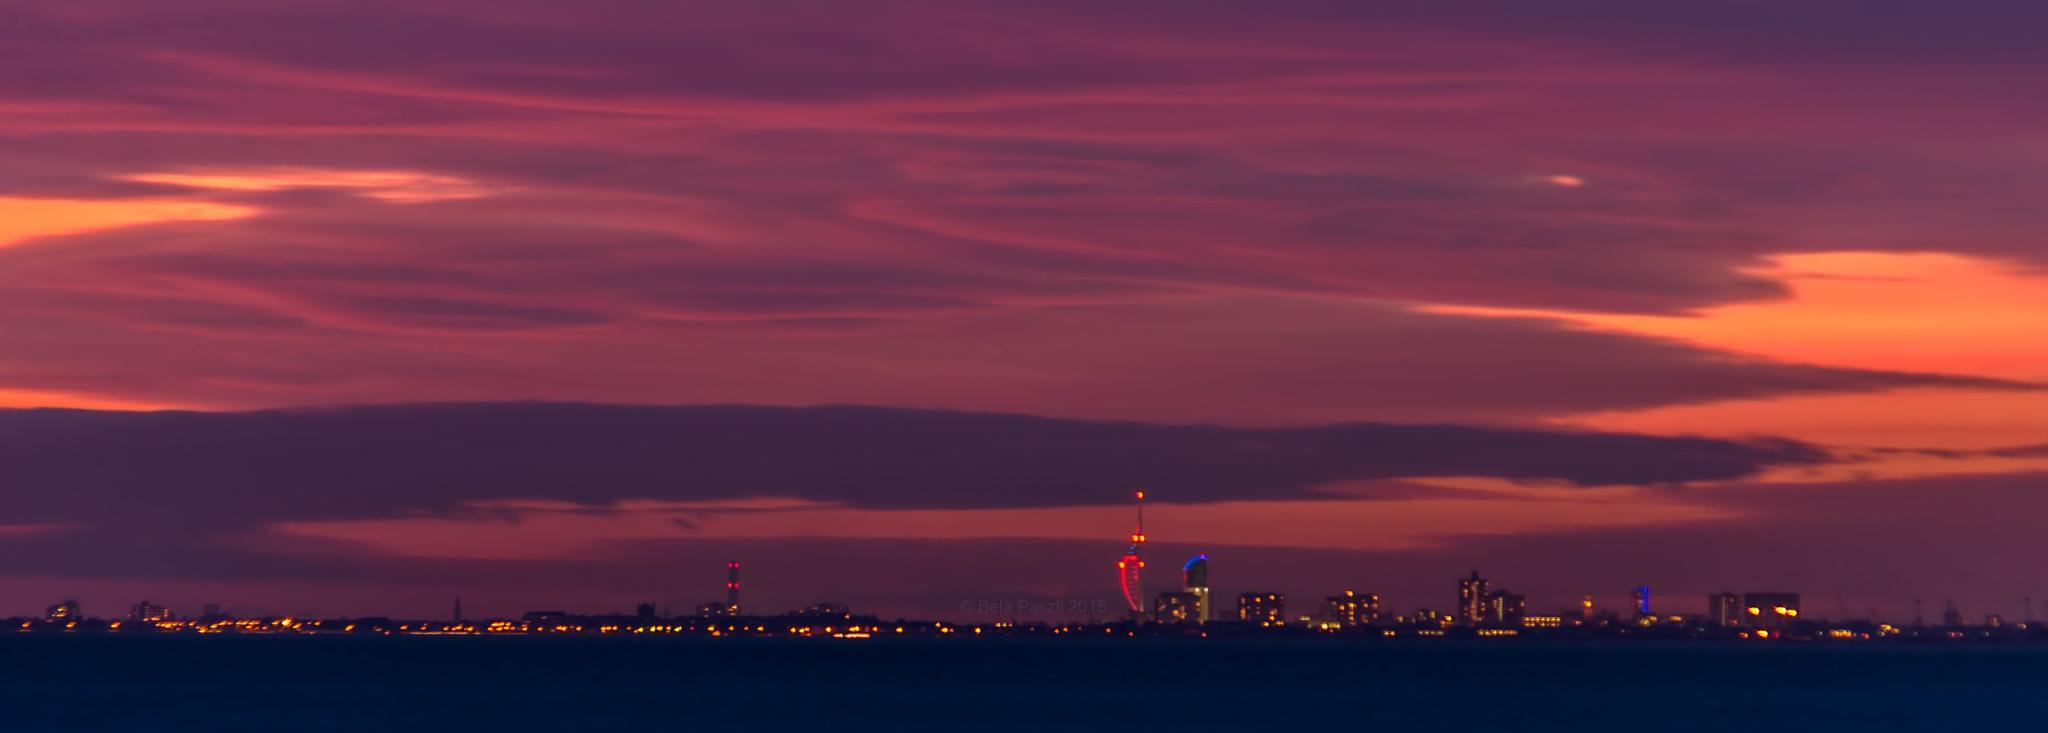 Portsmouth Harbour by BelaPaszti